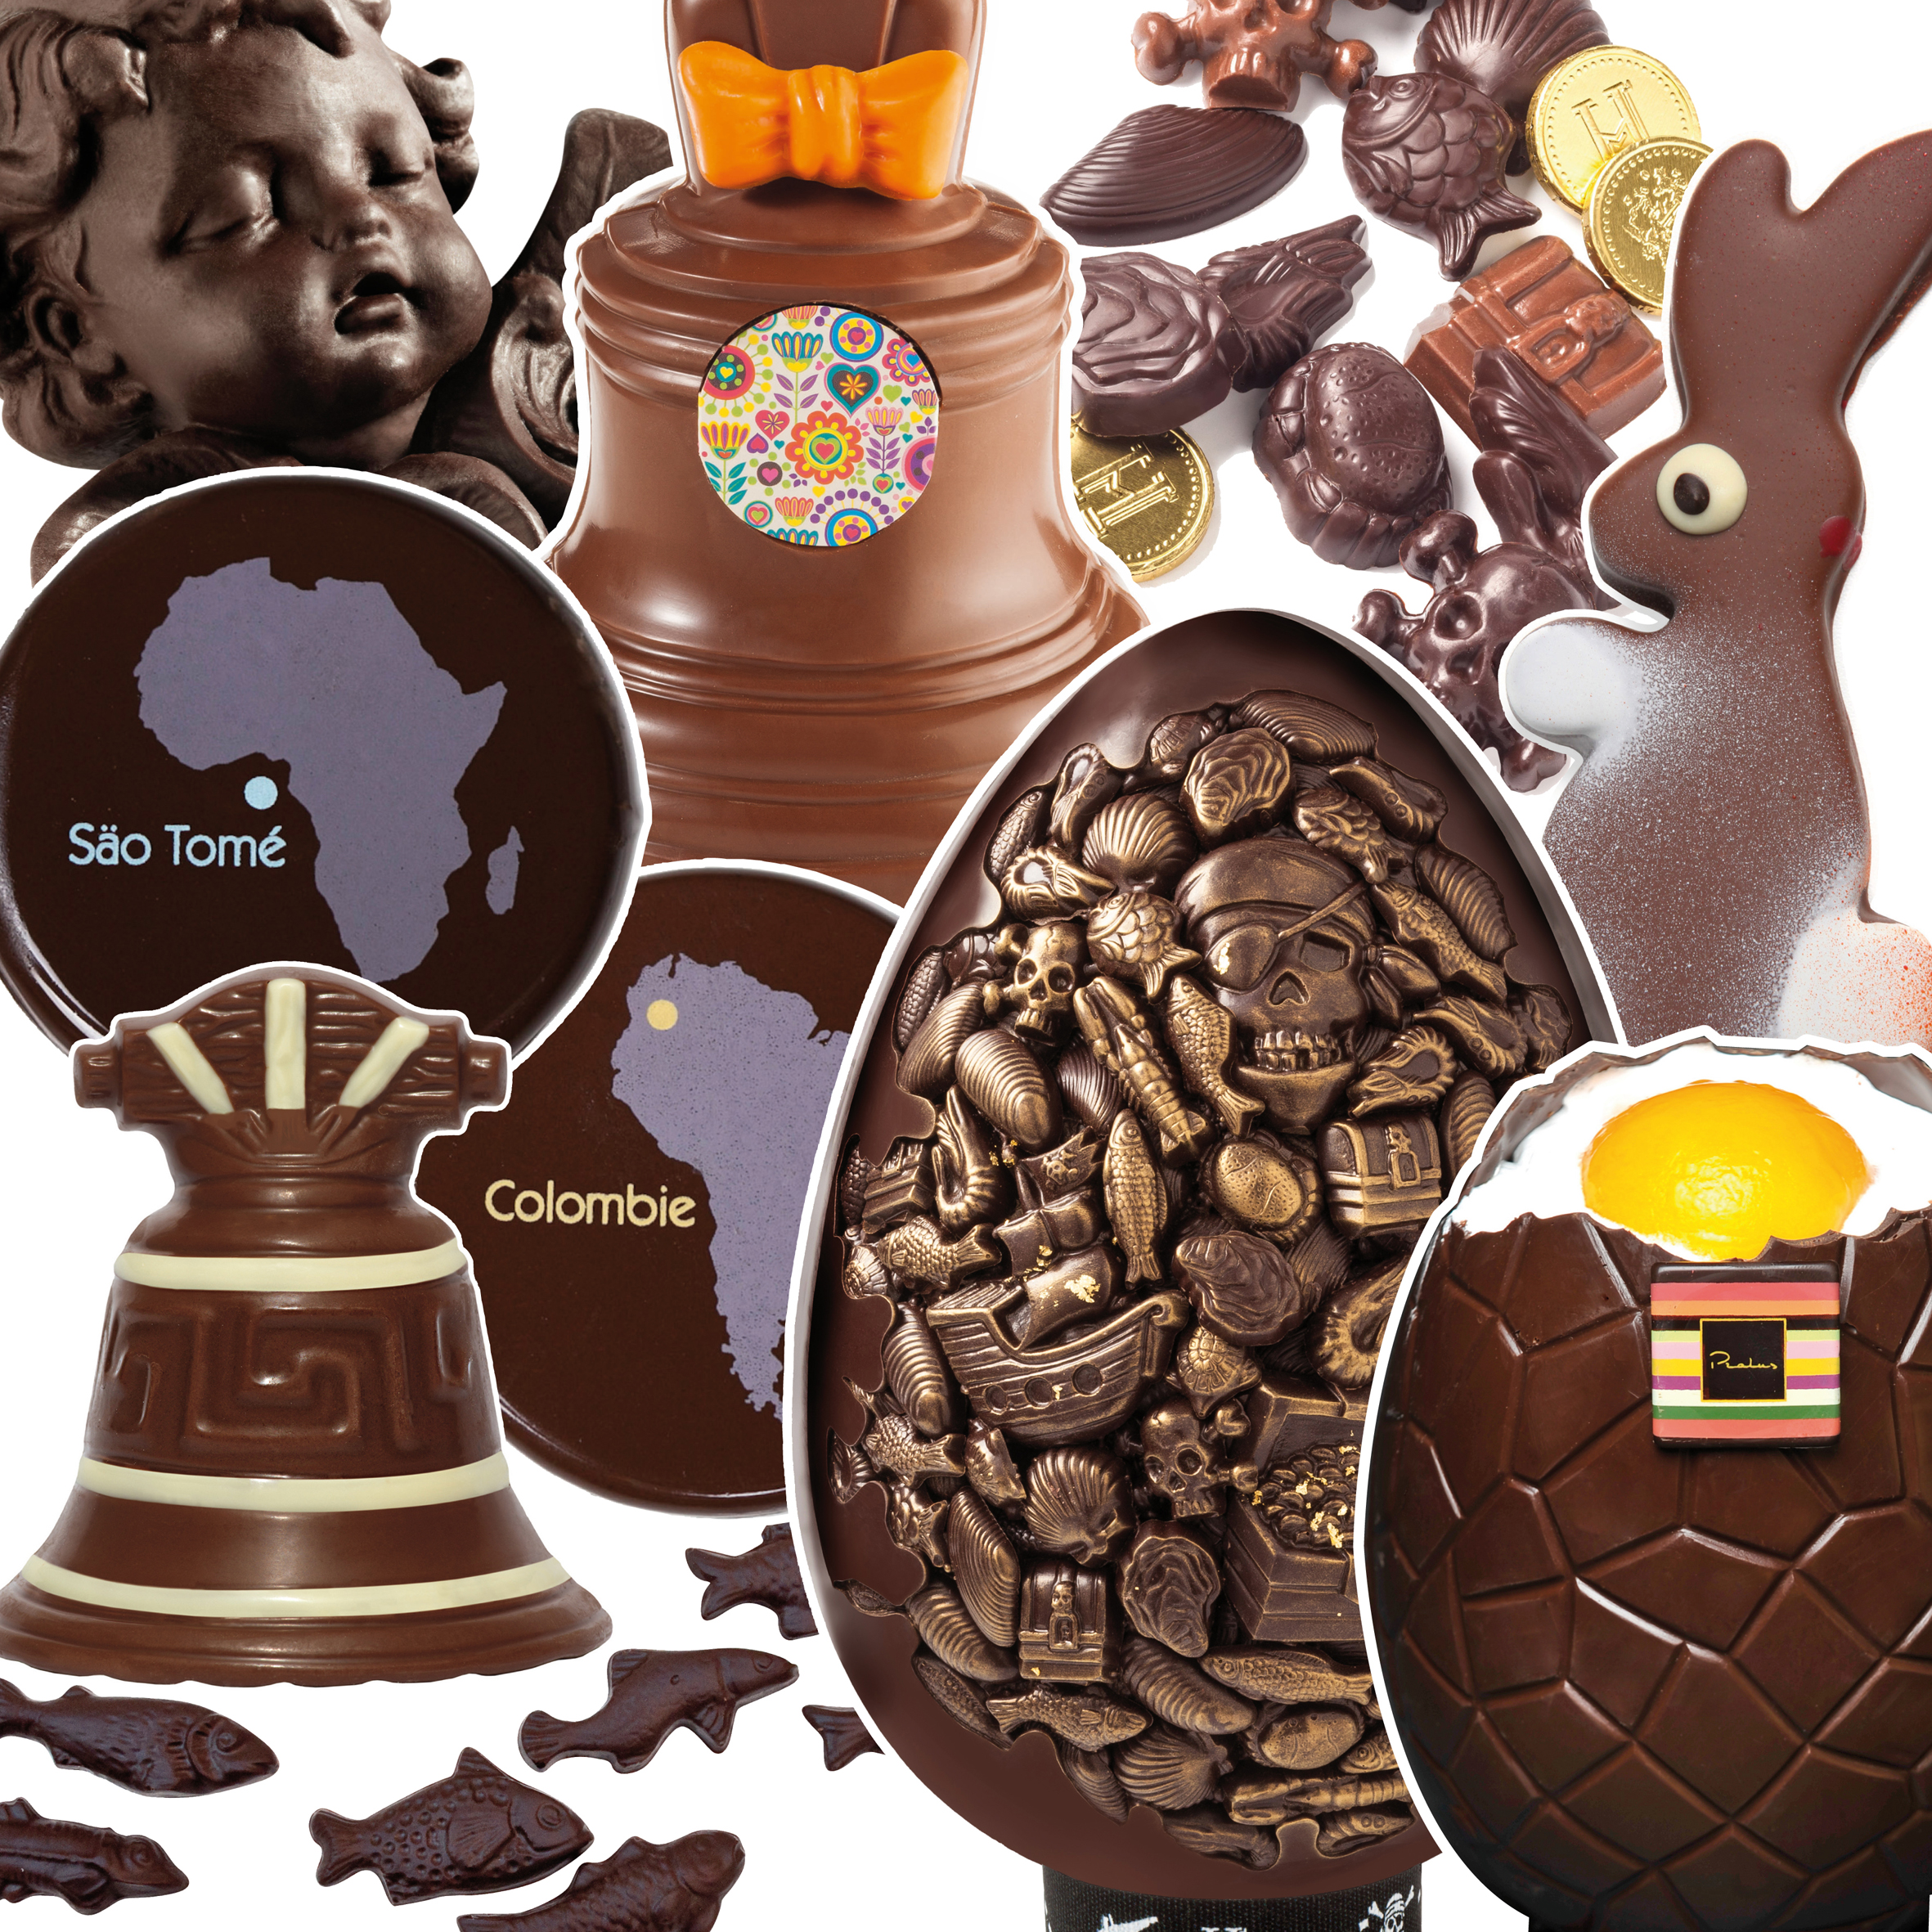 chocolat_paques_2013-1